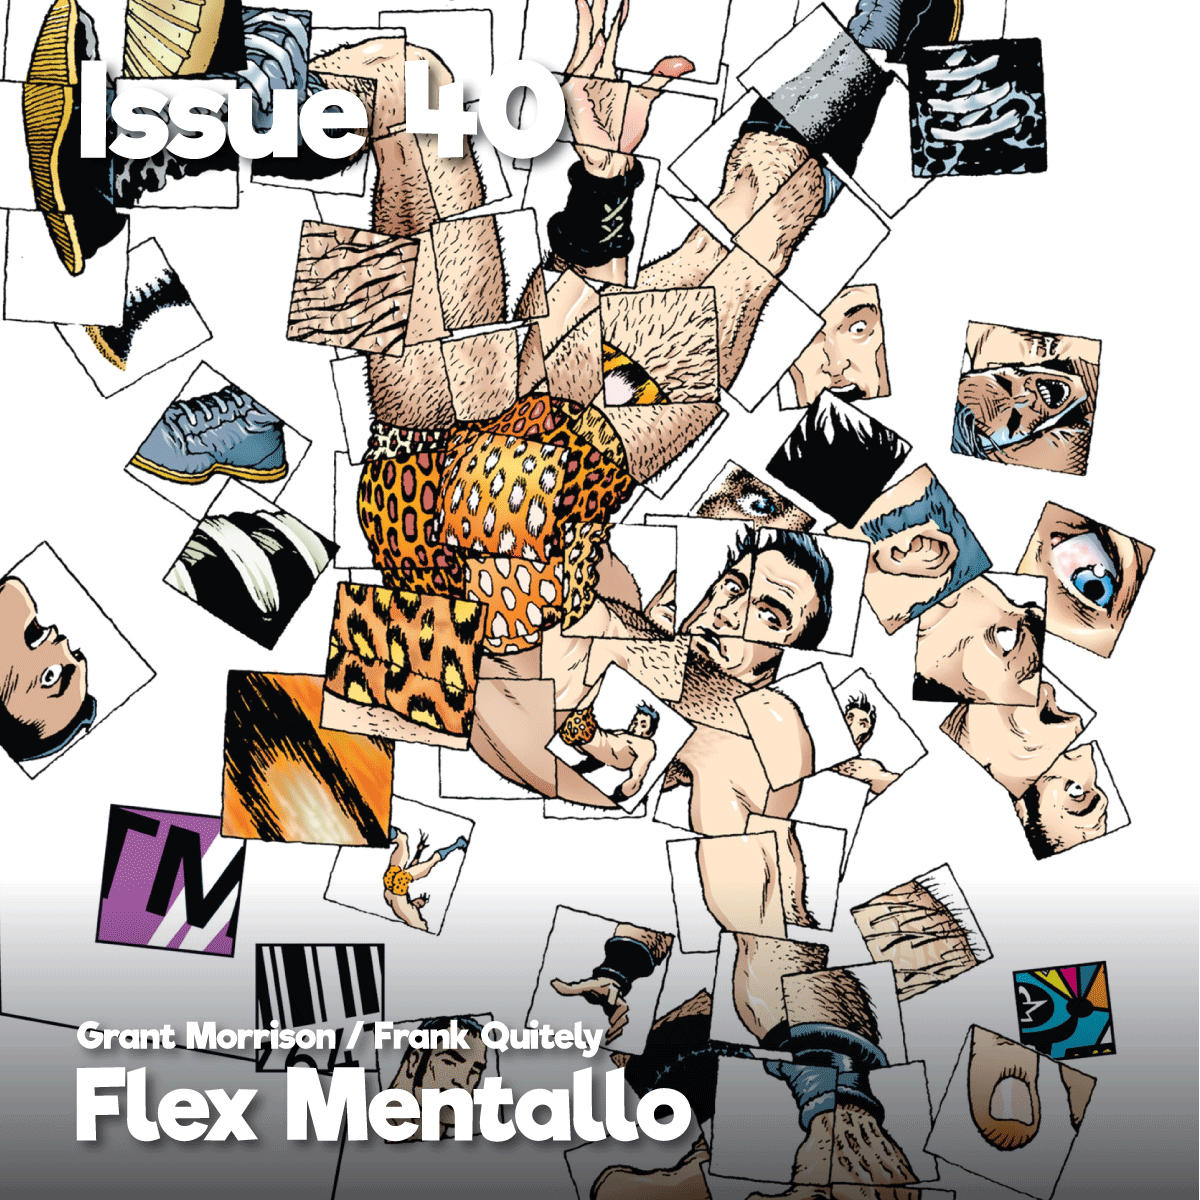 Issue40_FlexMentallo_1200x1200.png